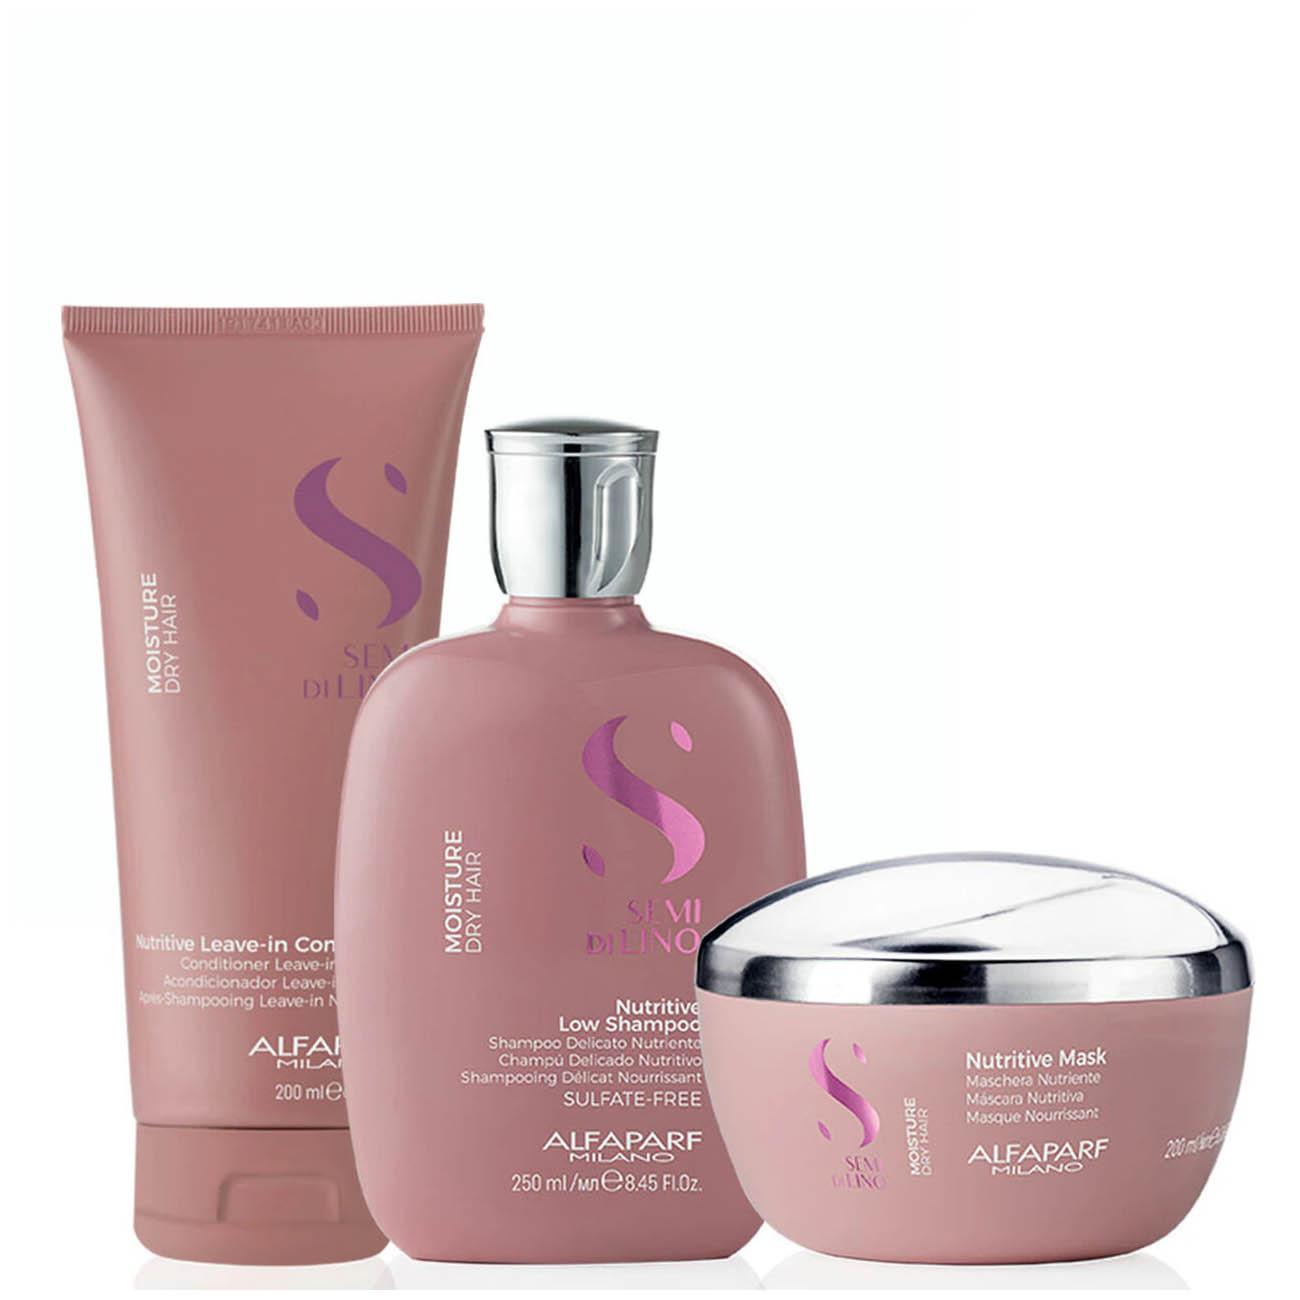 Alfaparf Milano Semi Di LINO Moisture Dry Hair Nutritive  Shampoo/Conditioner/ Mask Kit Home Care